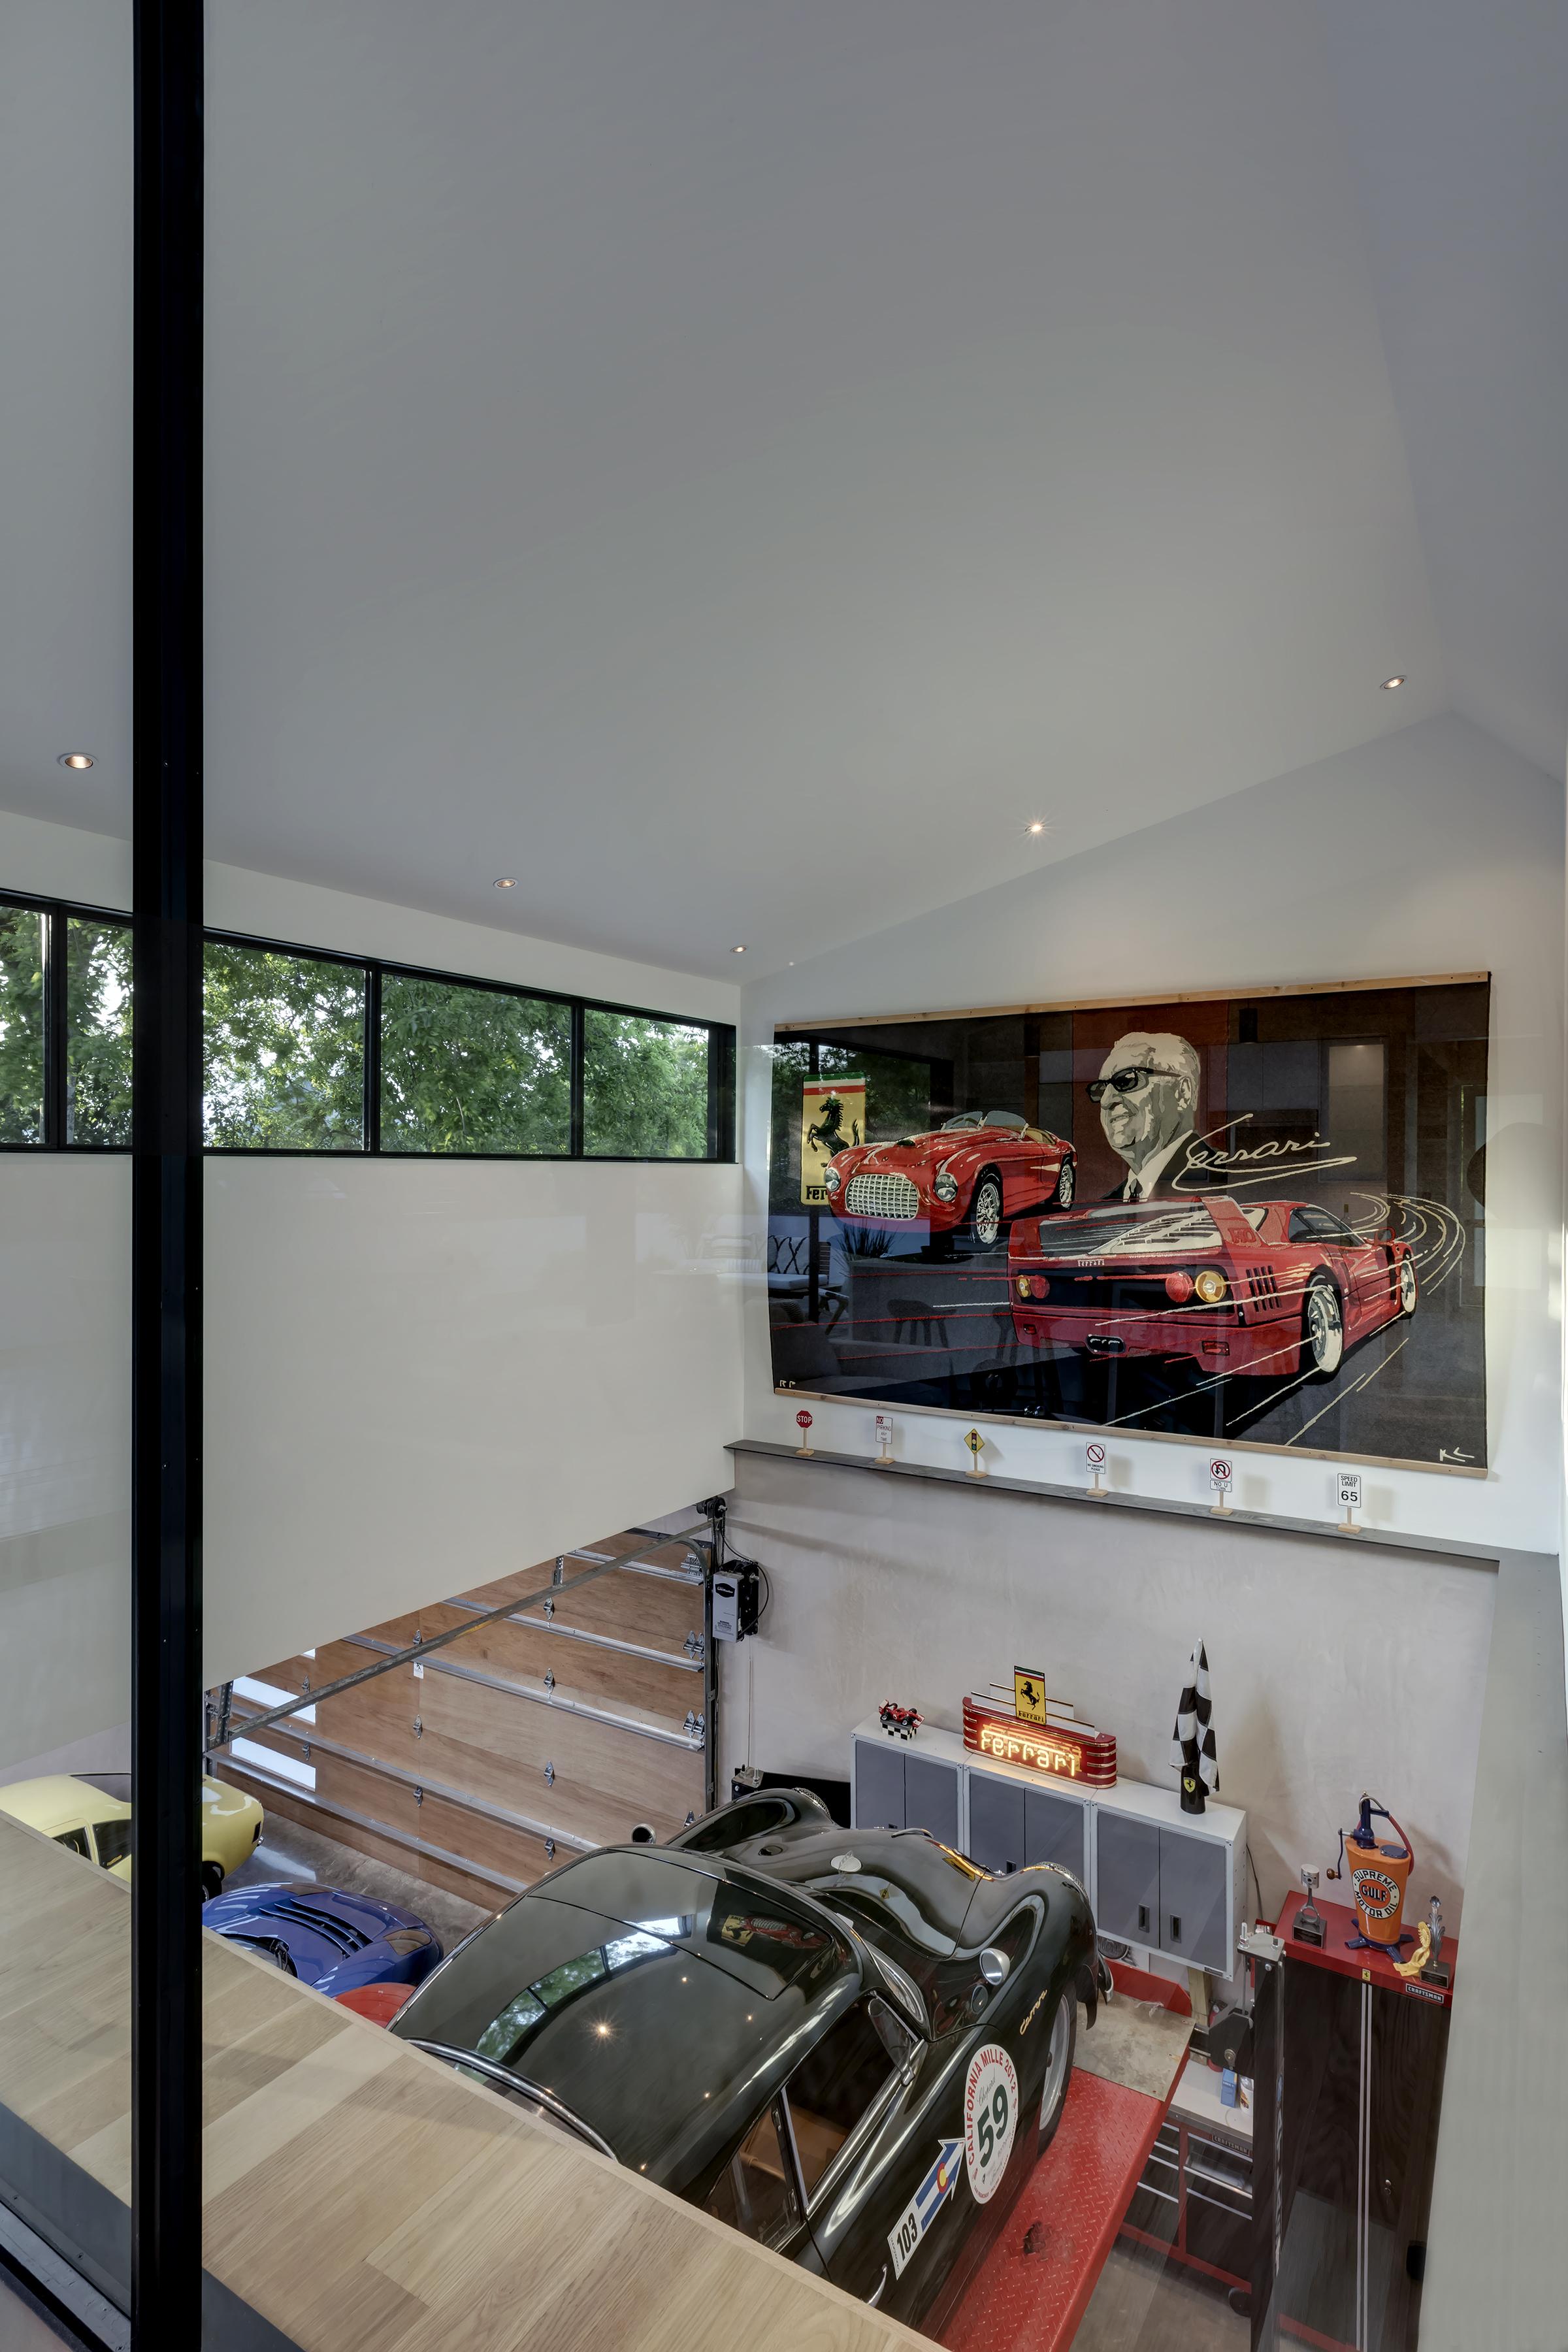 Matt Fajkus MF Architecture AutoHaus_Interior Photo 1 by Charles Davis Smith.jpg